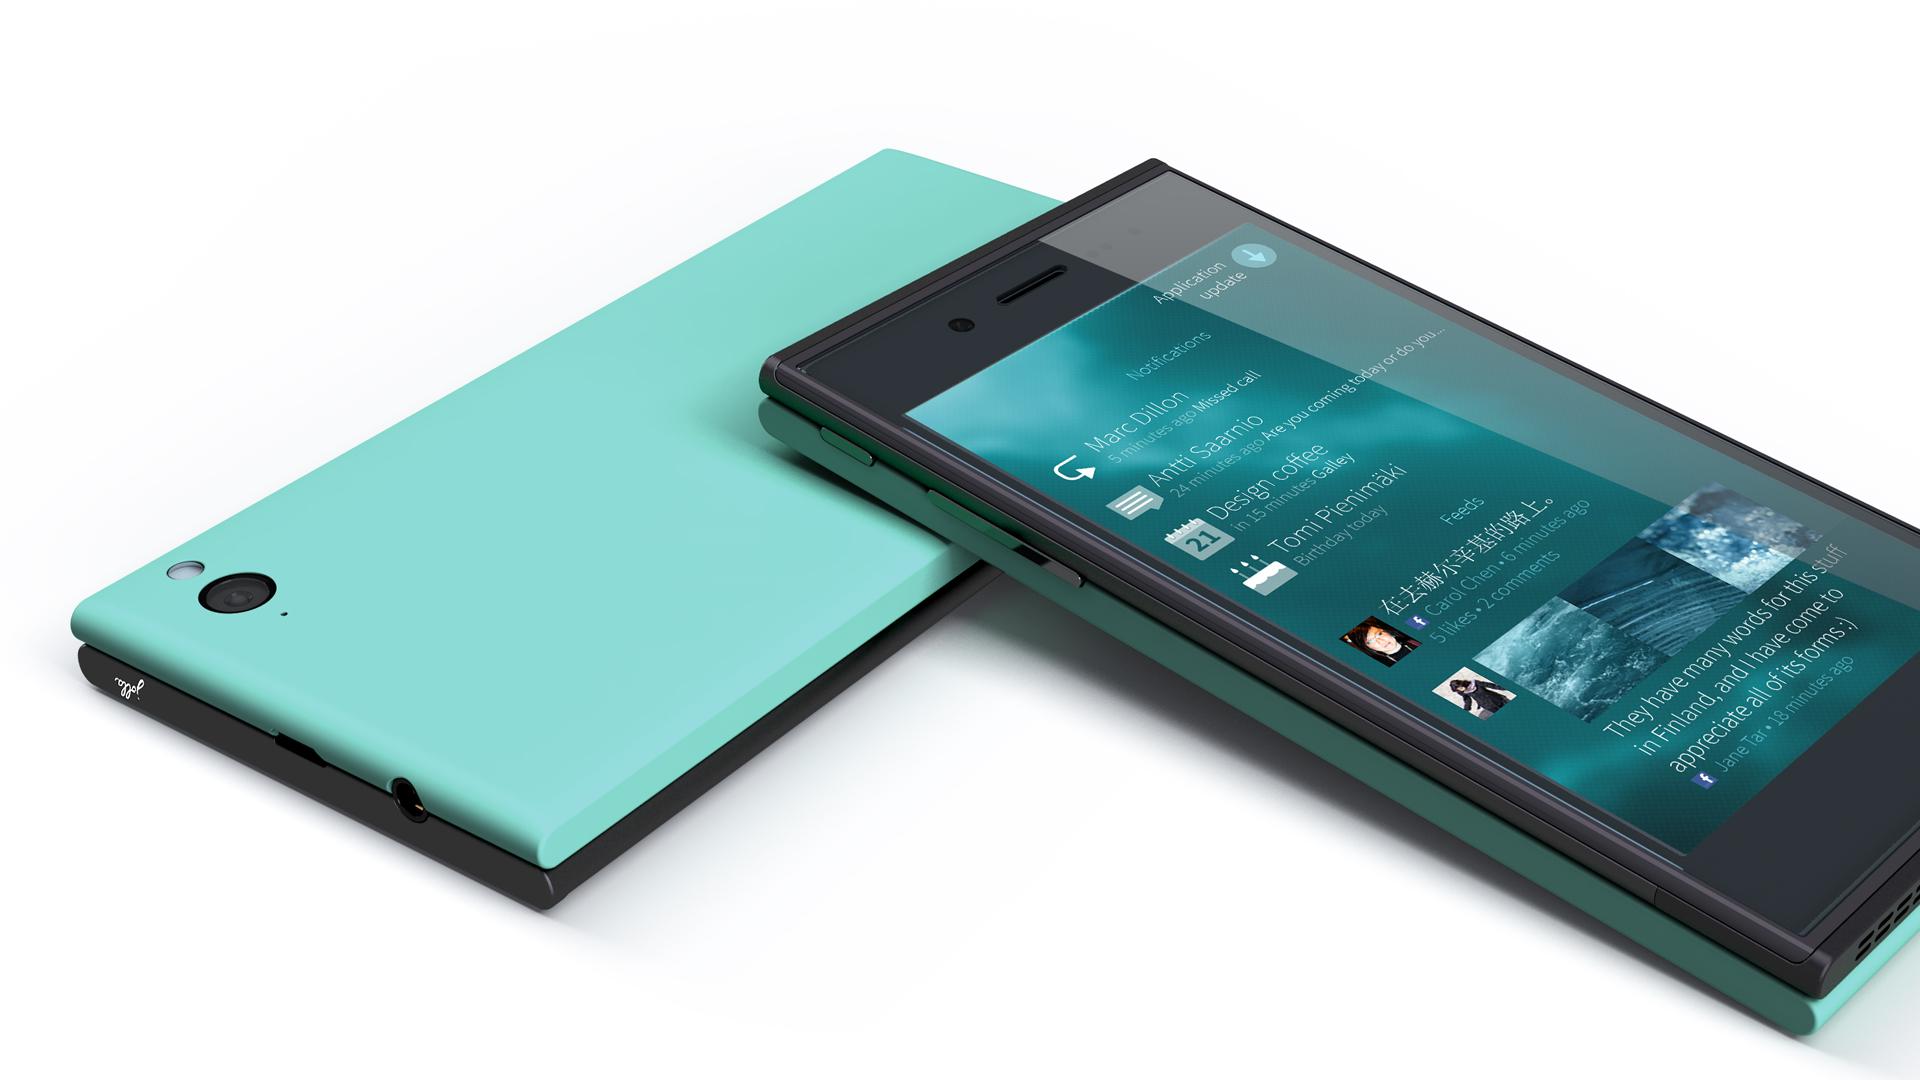 Phone Nokia New Android Phone Launch 2014 the jolla smartphone sailfish os dickson otieno